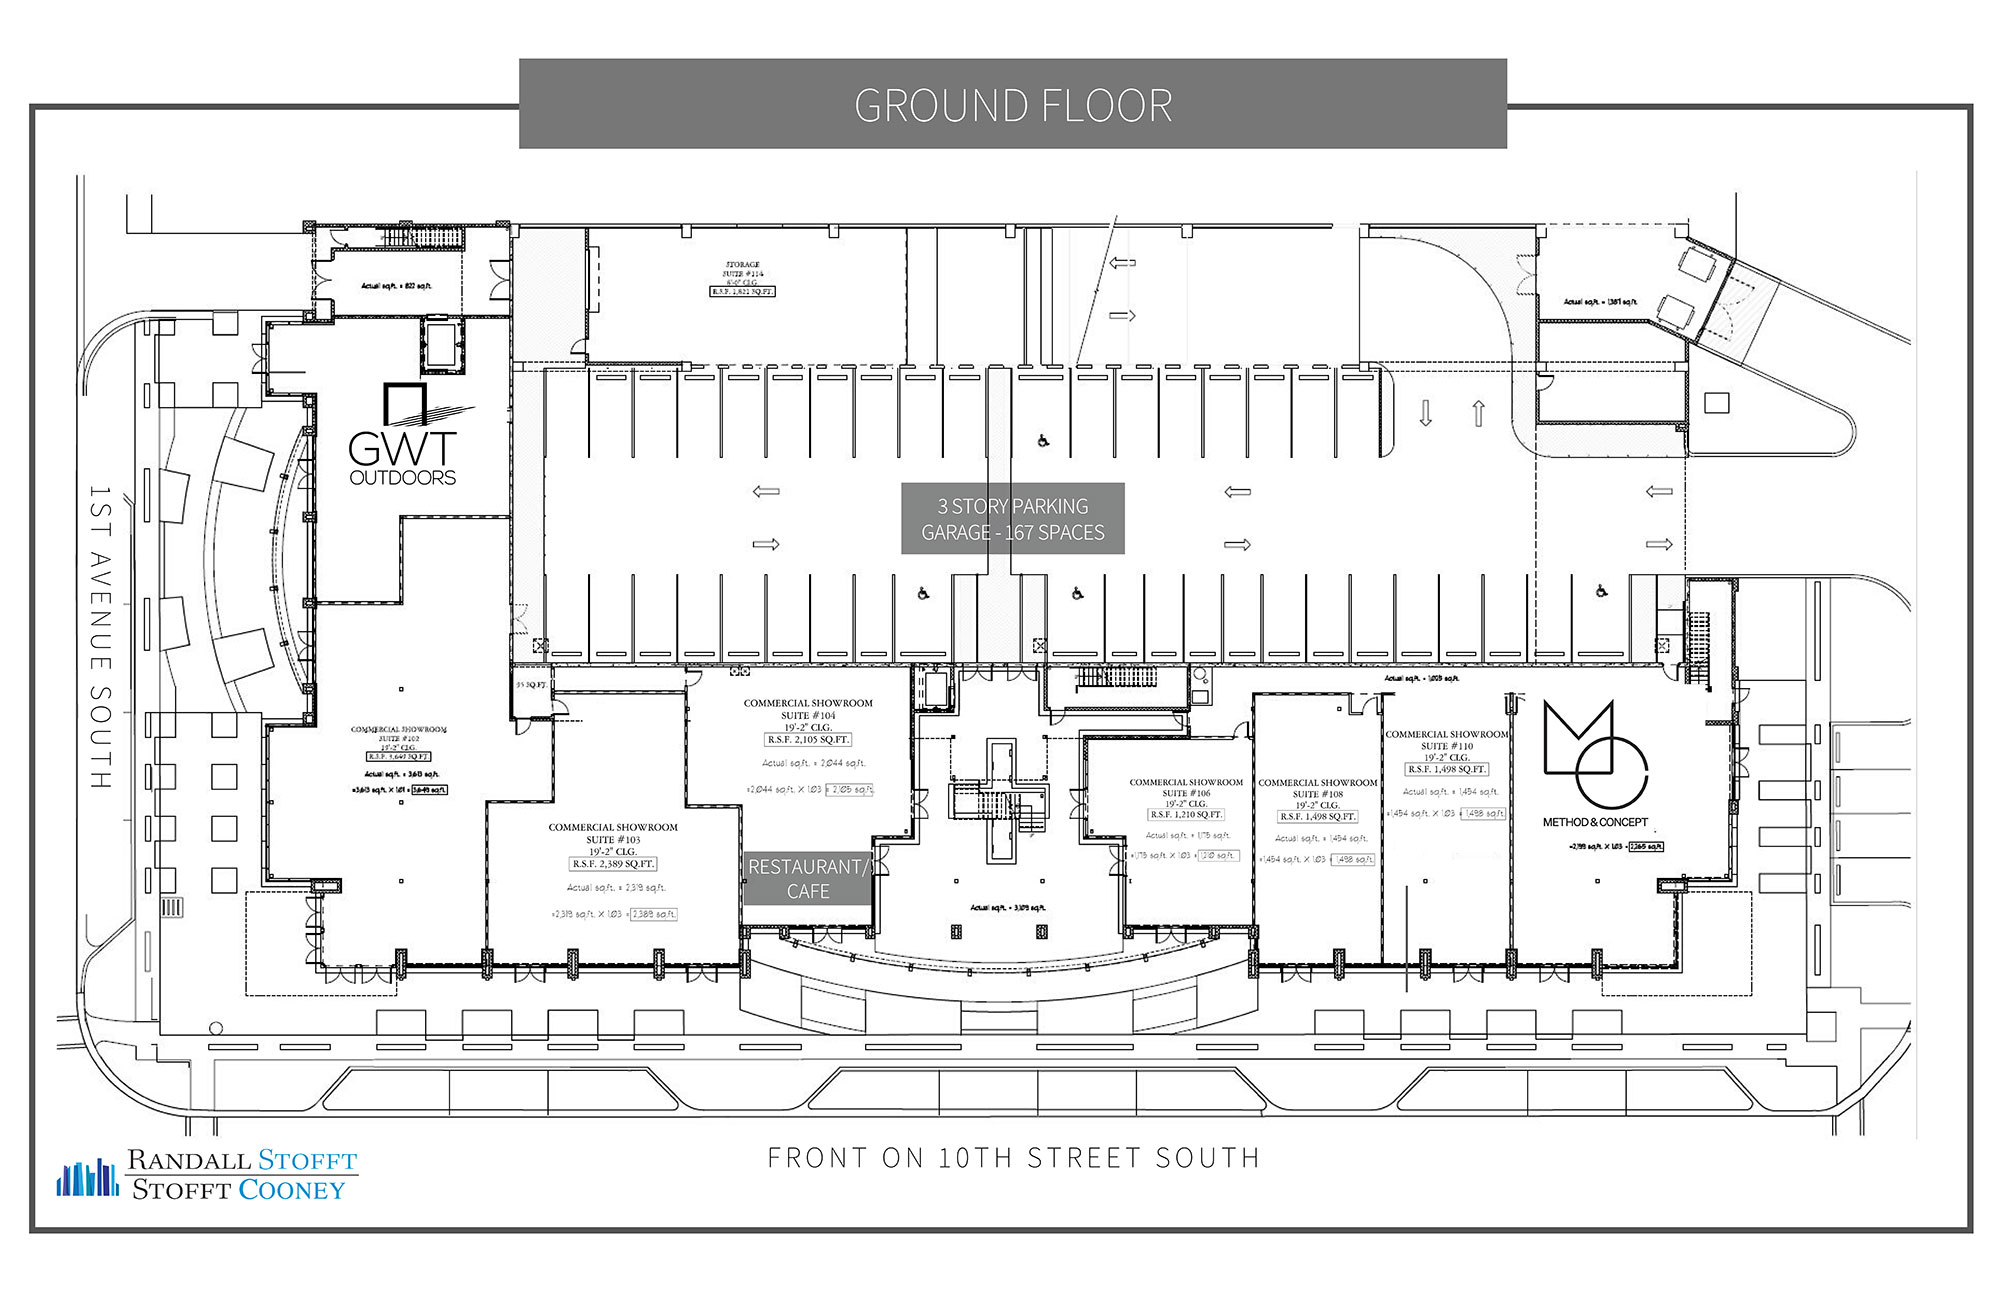 Ground Floor Leasing Plan